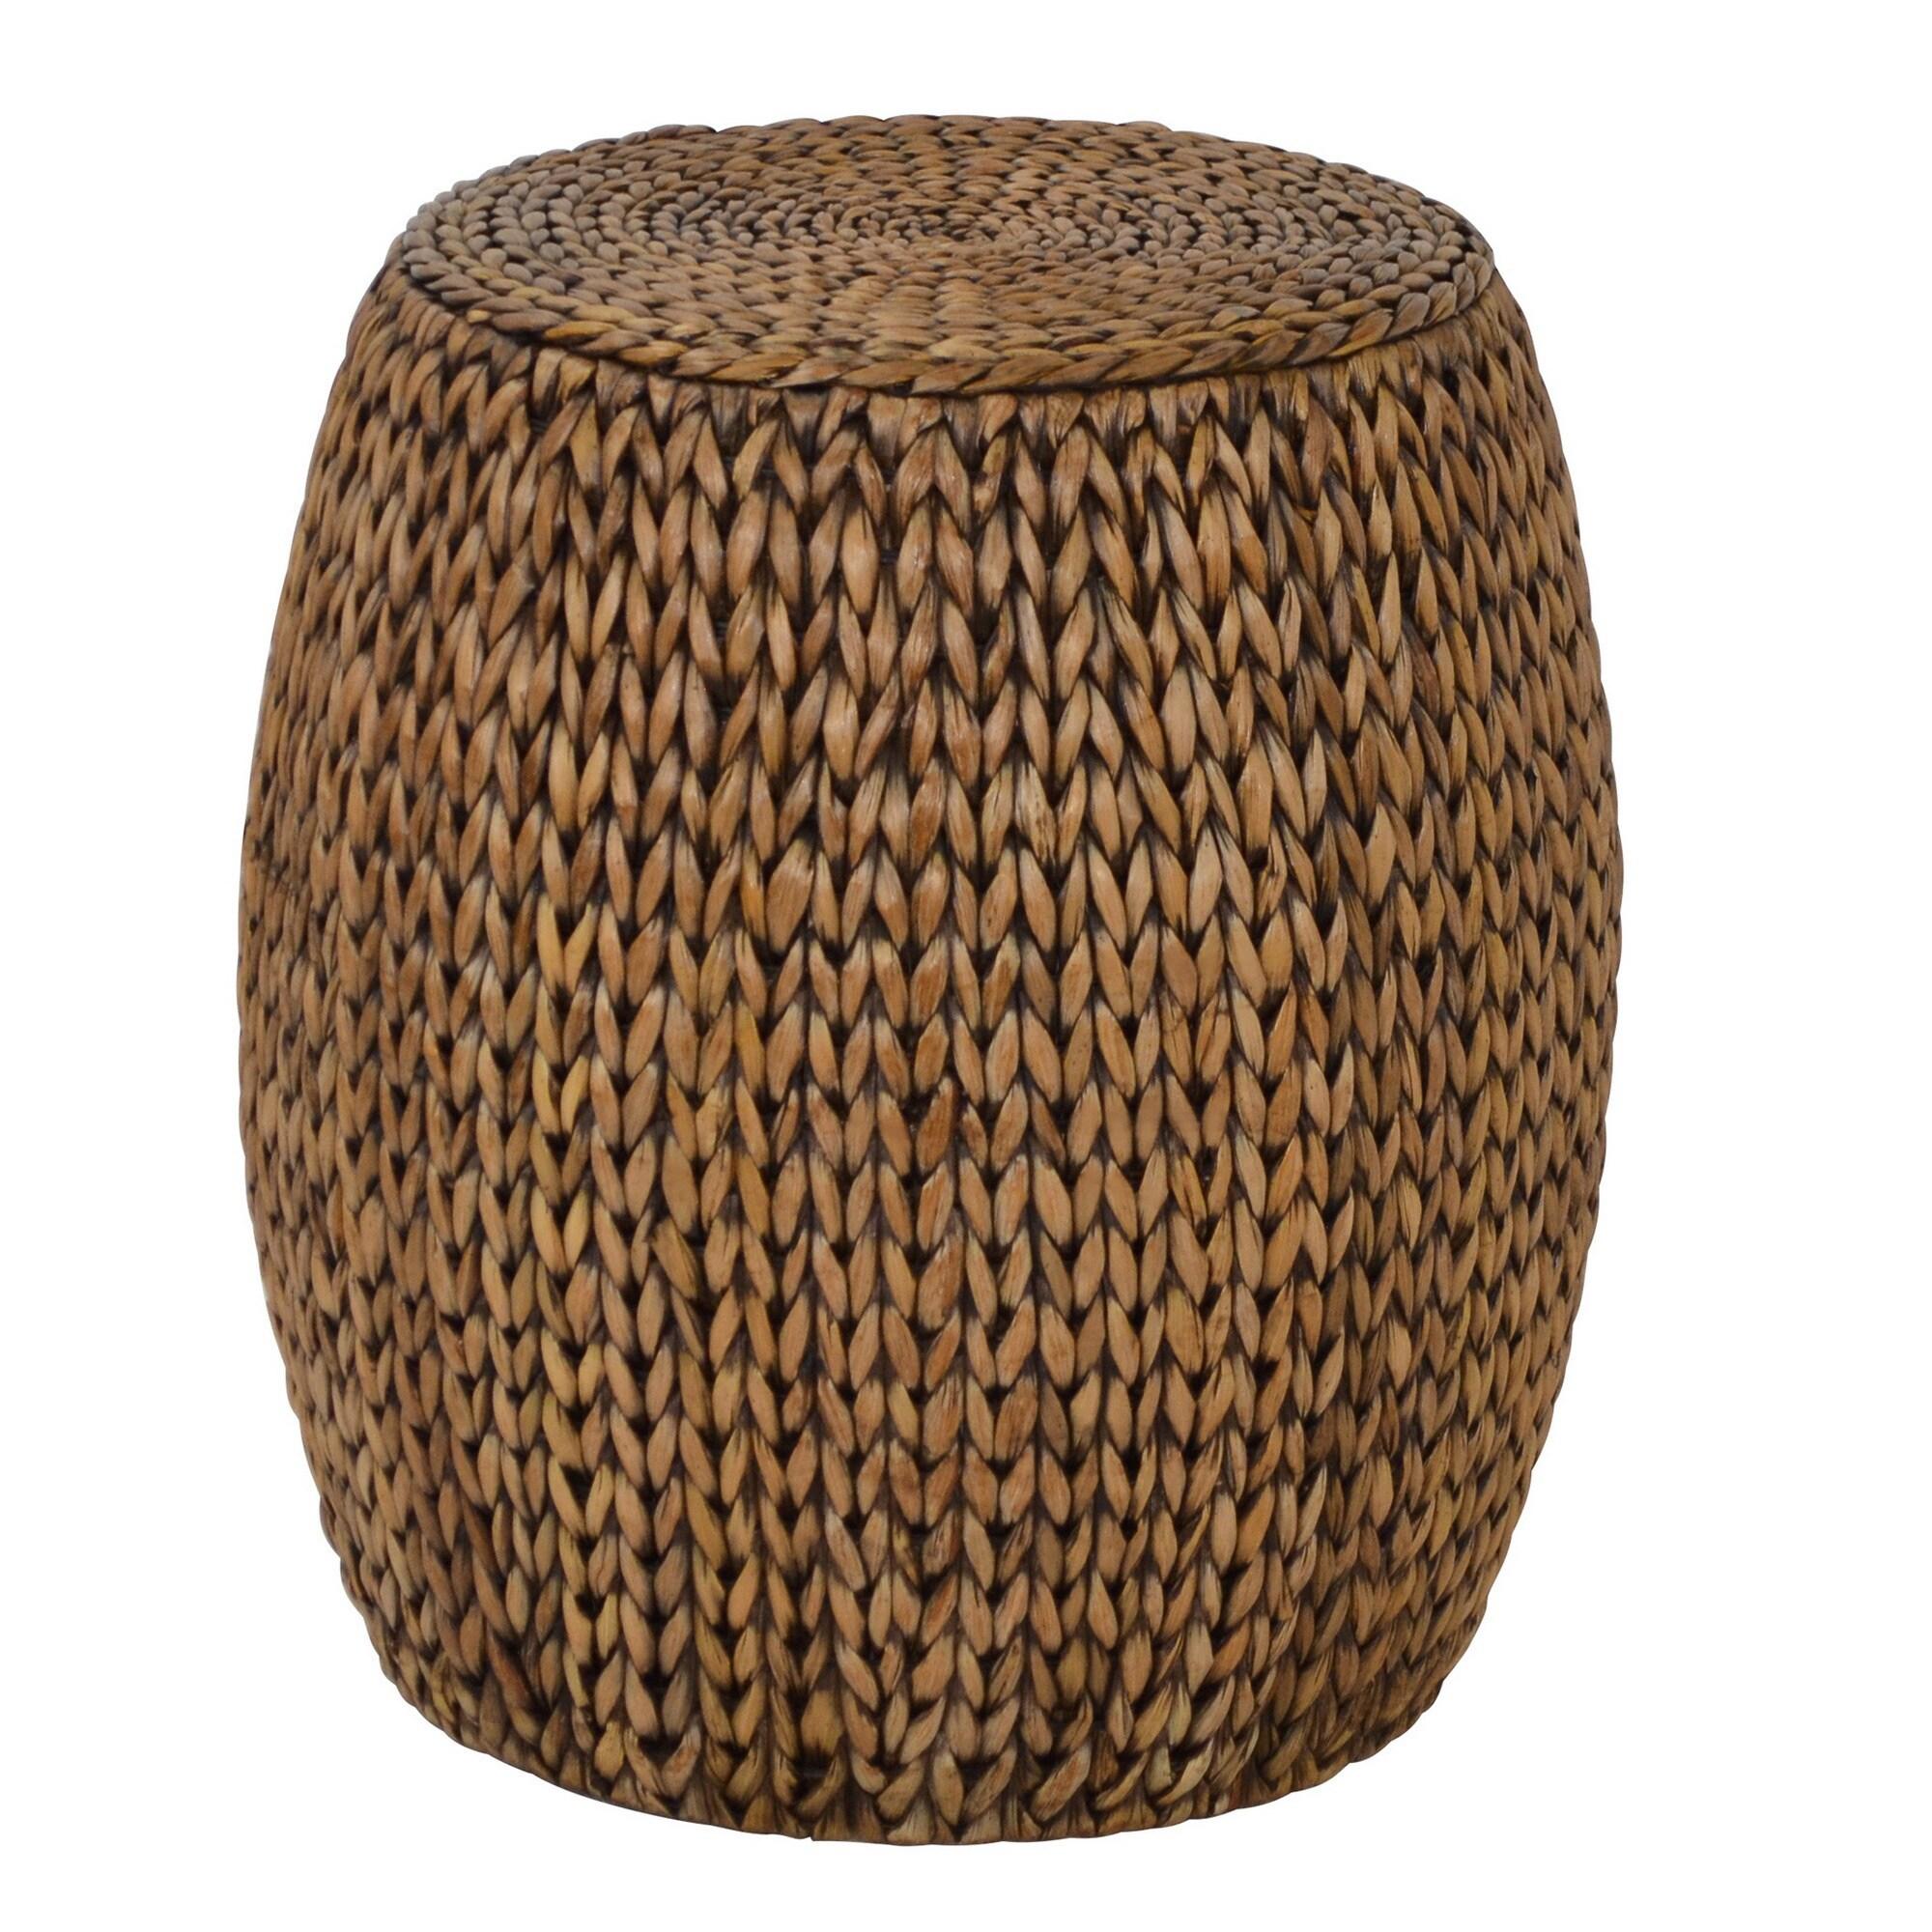 galleriedecortalldrumaccenttable. gallerie decor tall drum accent table  ebay